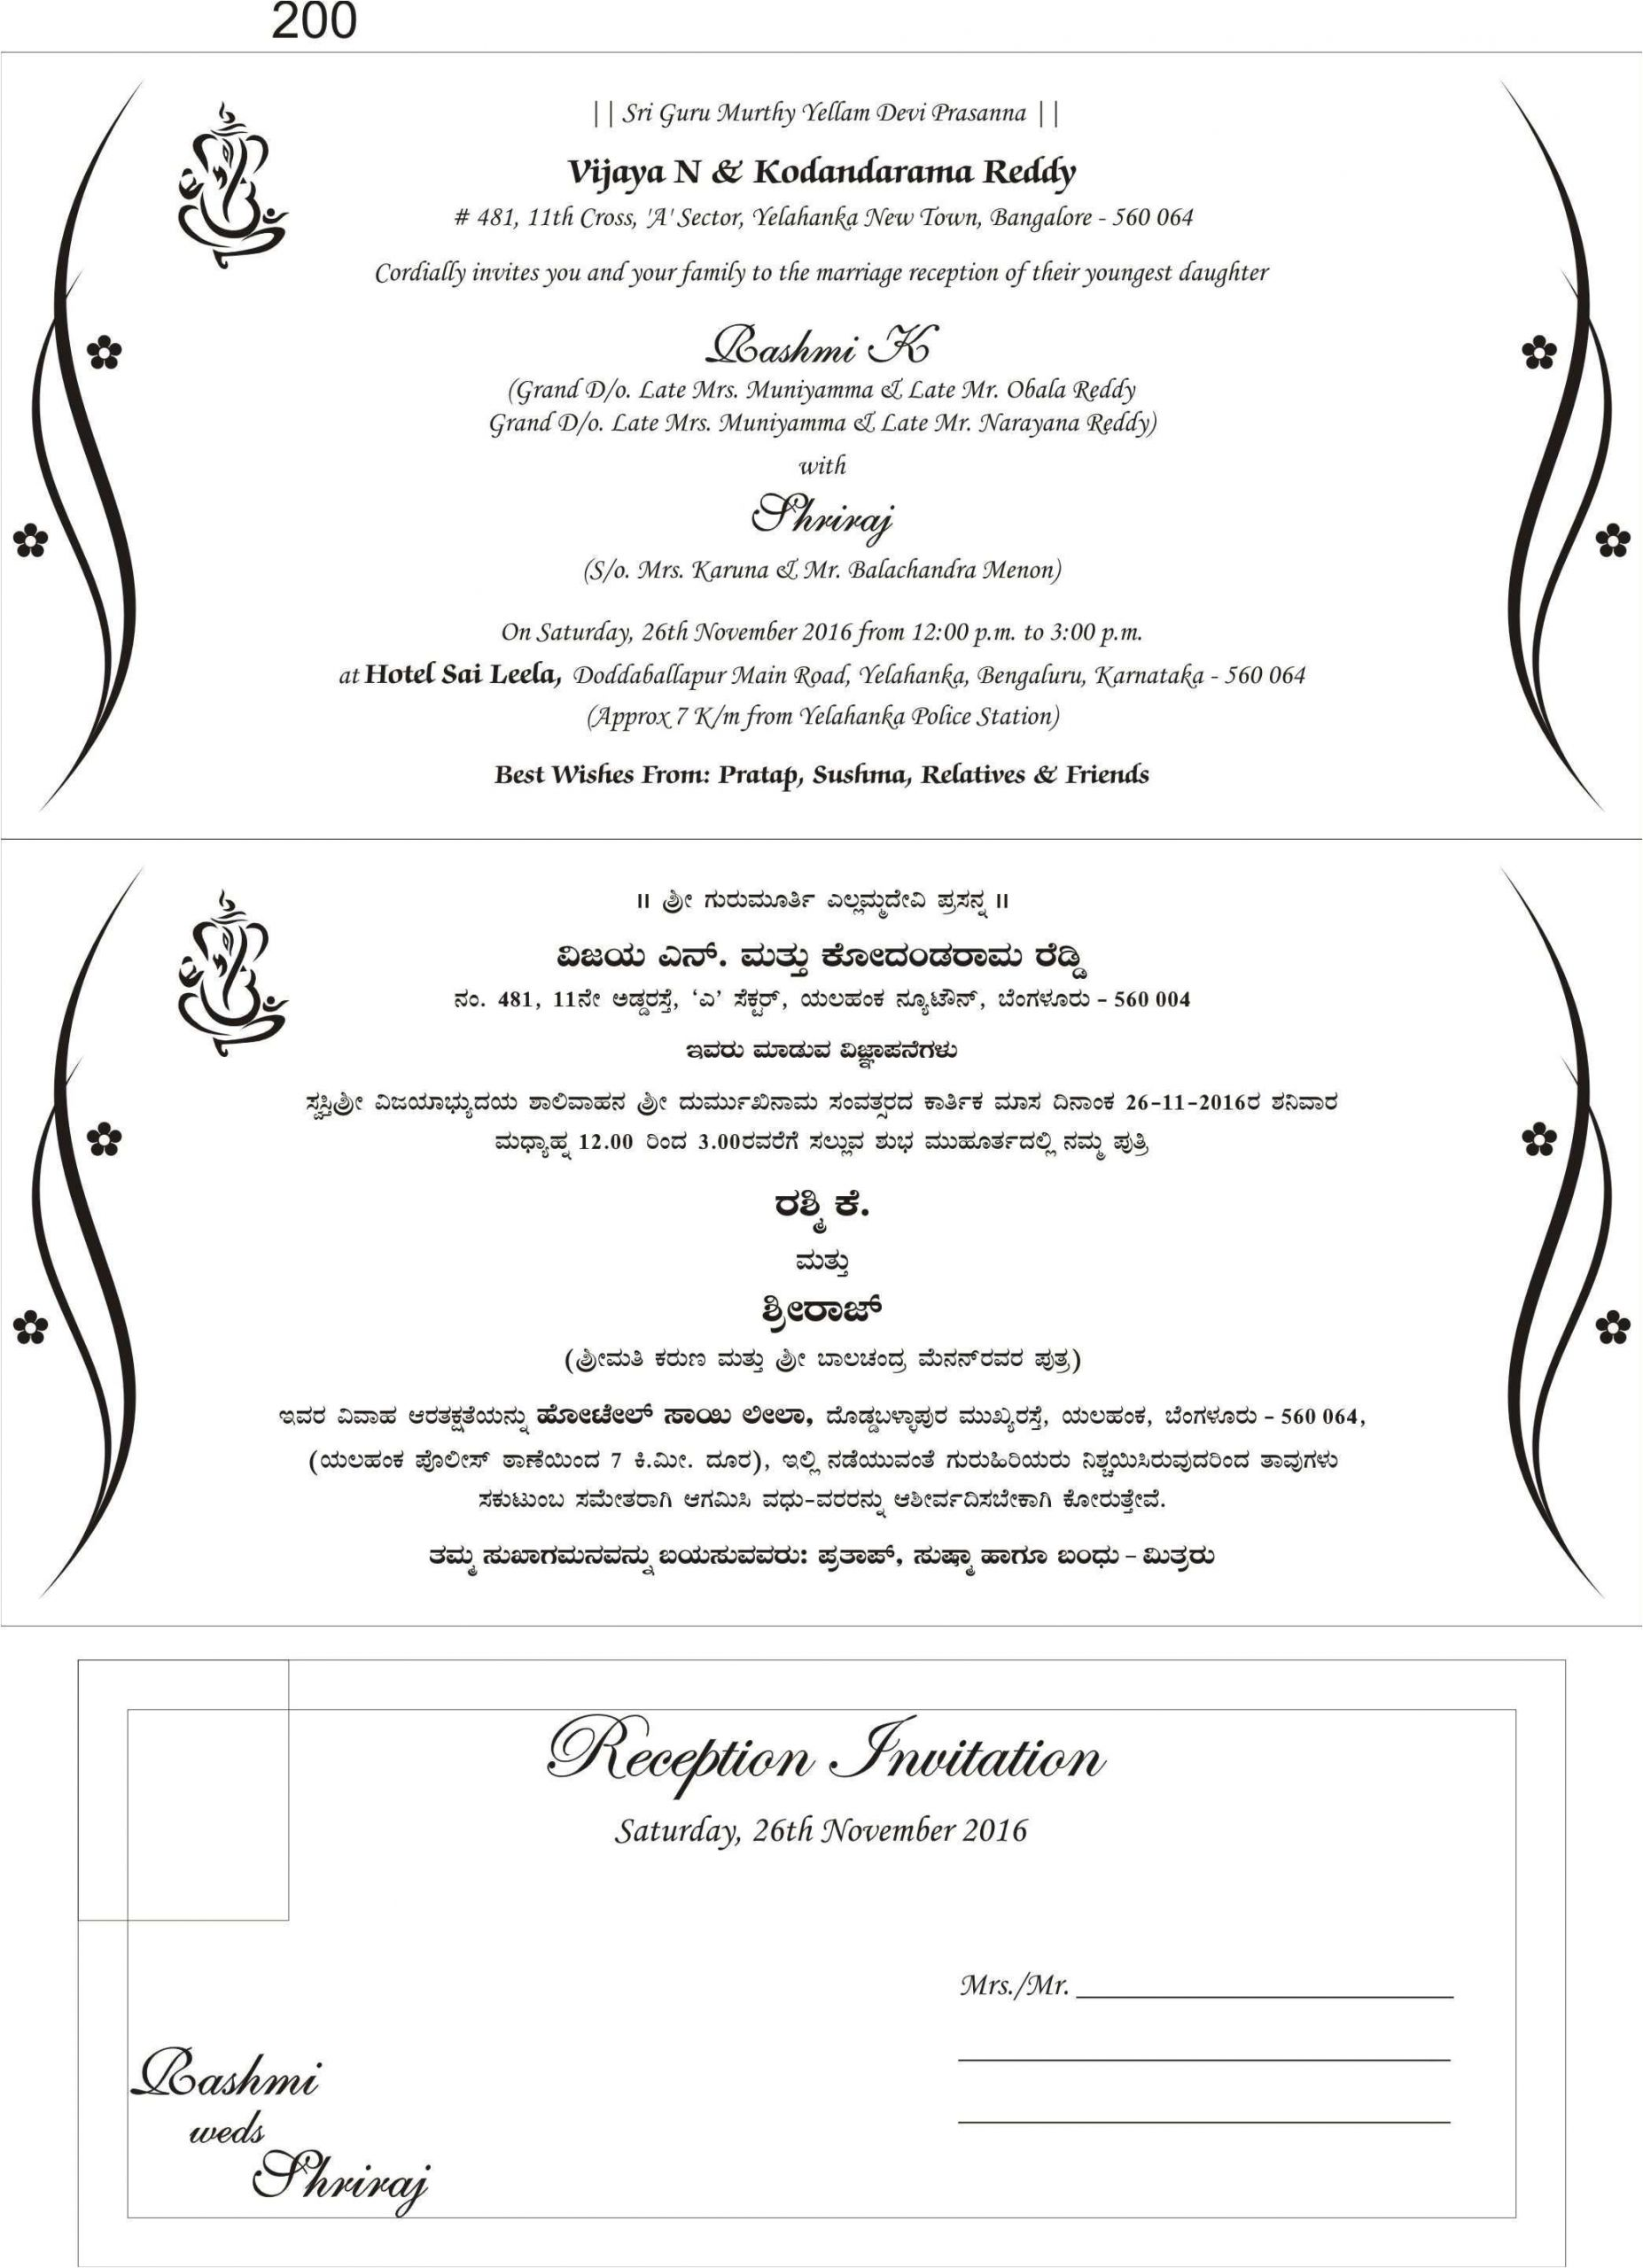 Marriage Invitation Card format In Kannada Pdf Kannada Wedding Invitation Template Cards Design Templates